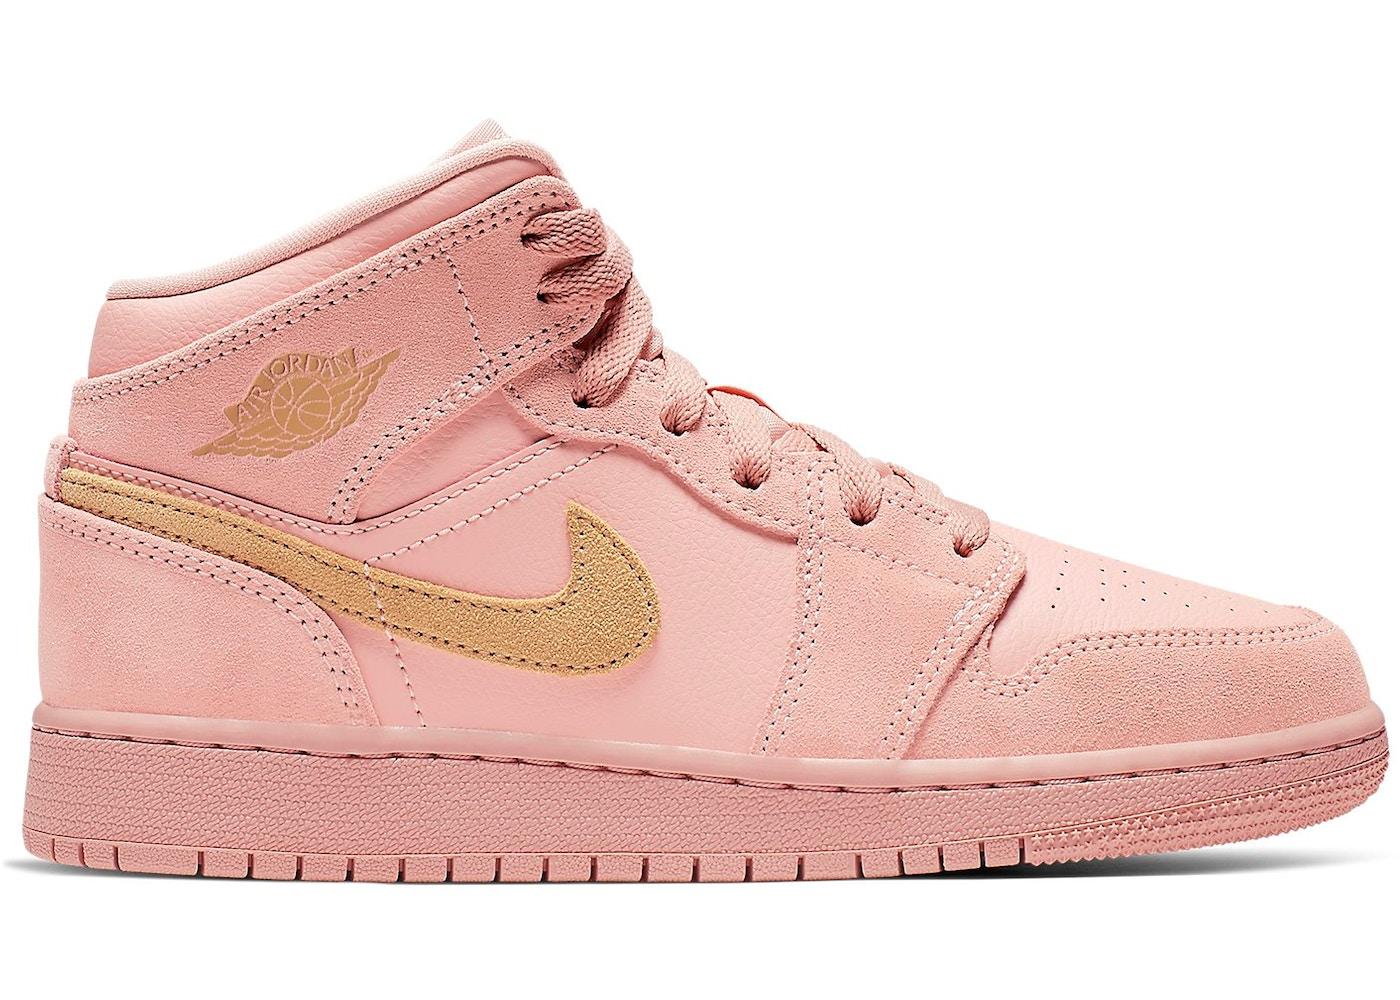 38df7ae1b99bf Air Jordan 1 Shoes - Release Date